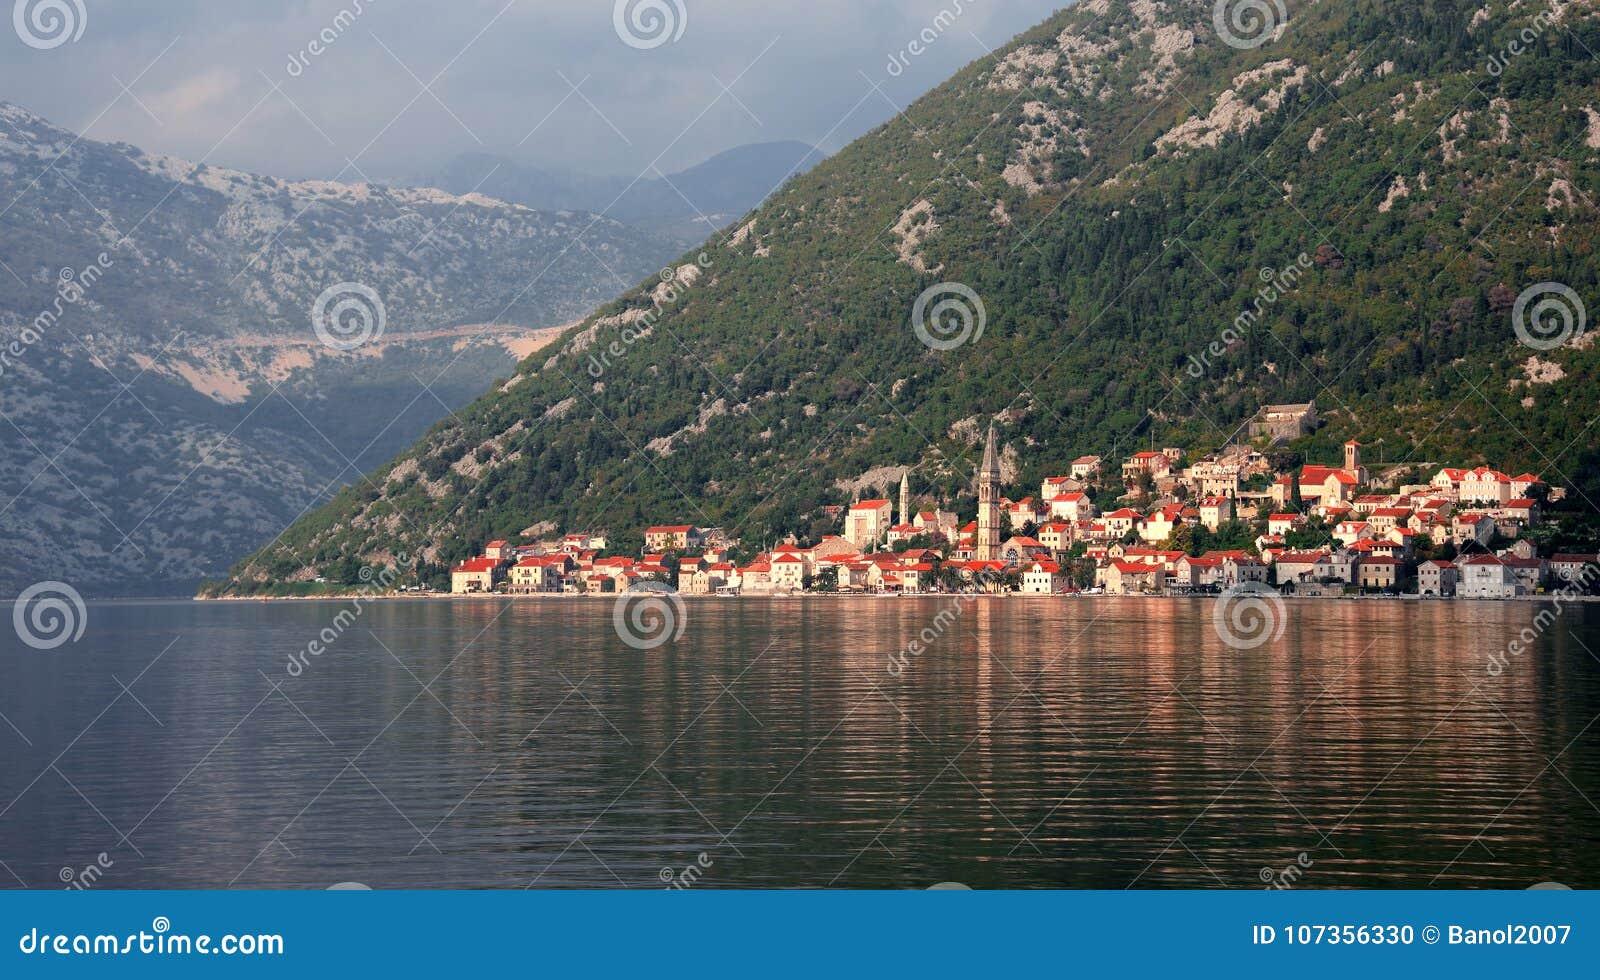 Perast, hidden ancient city. Reflection of centuries.